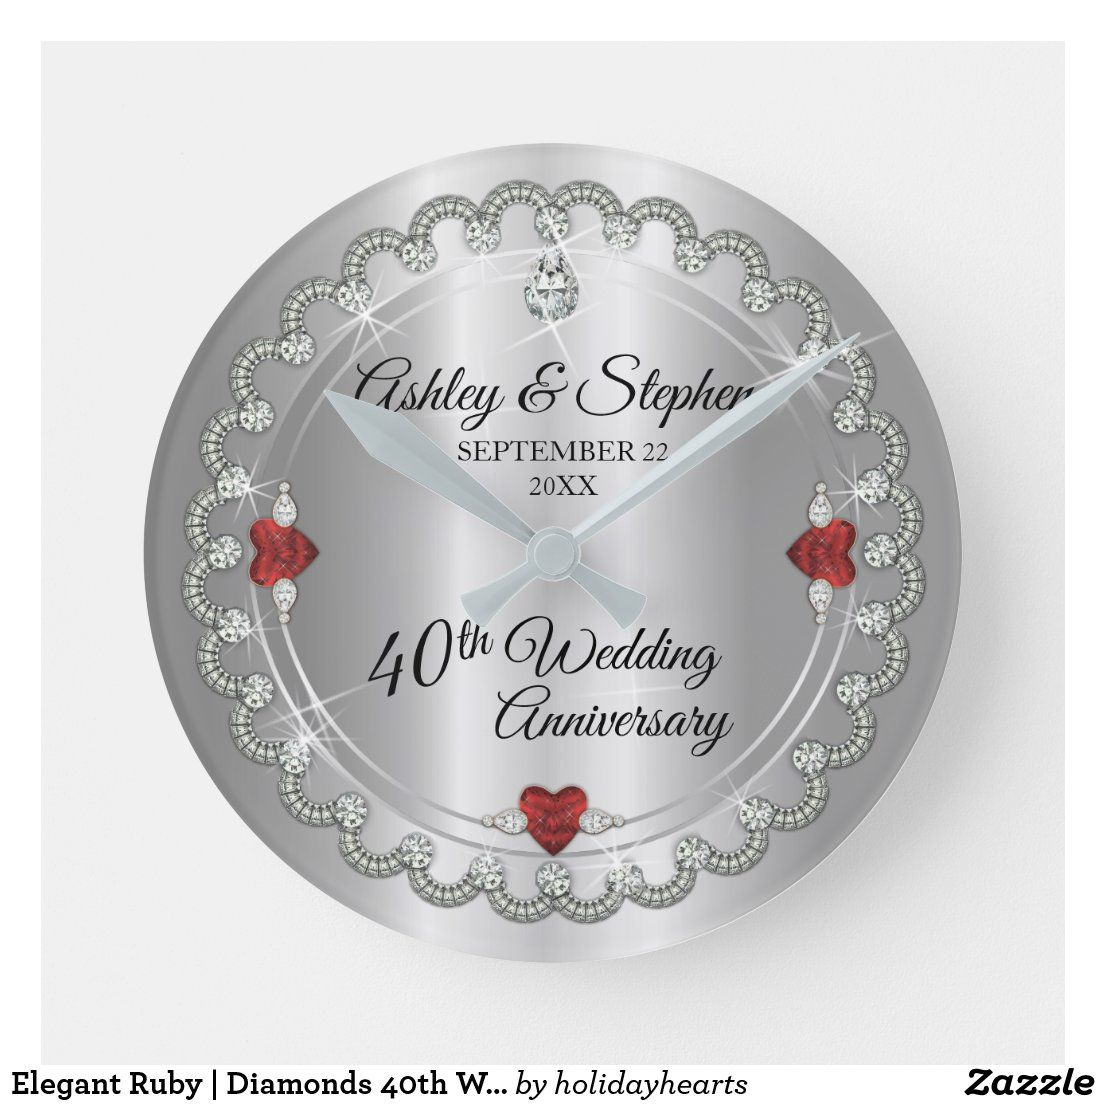 Pin on Wedding/Anniversary Gifts